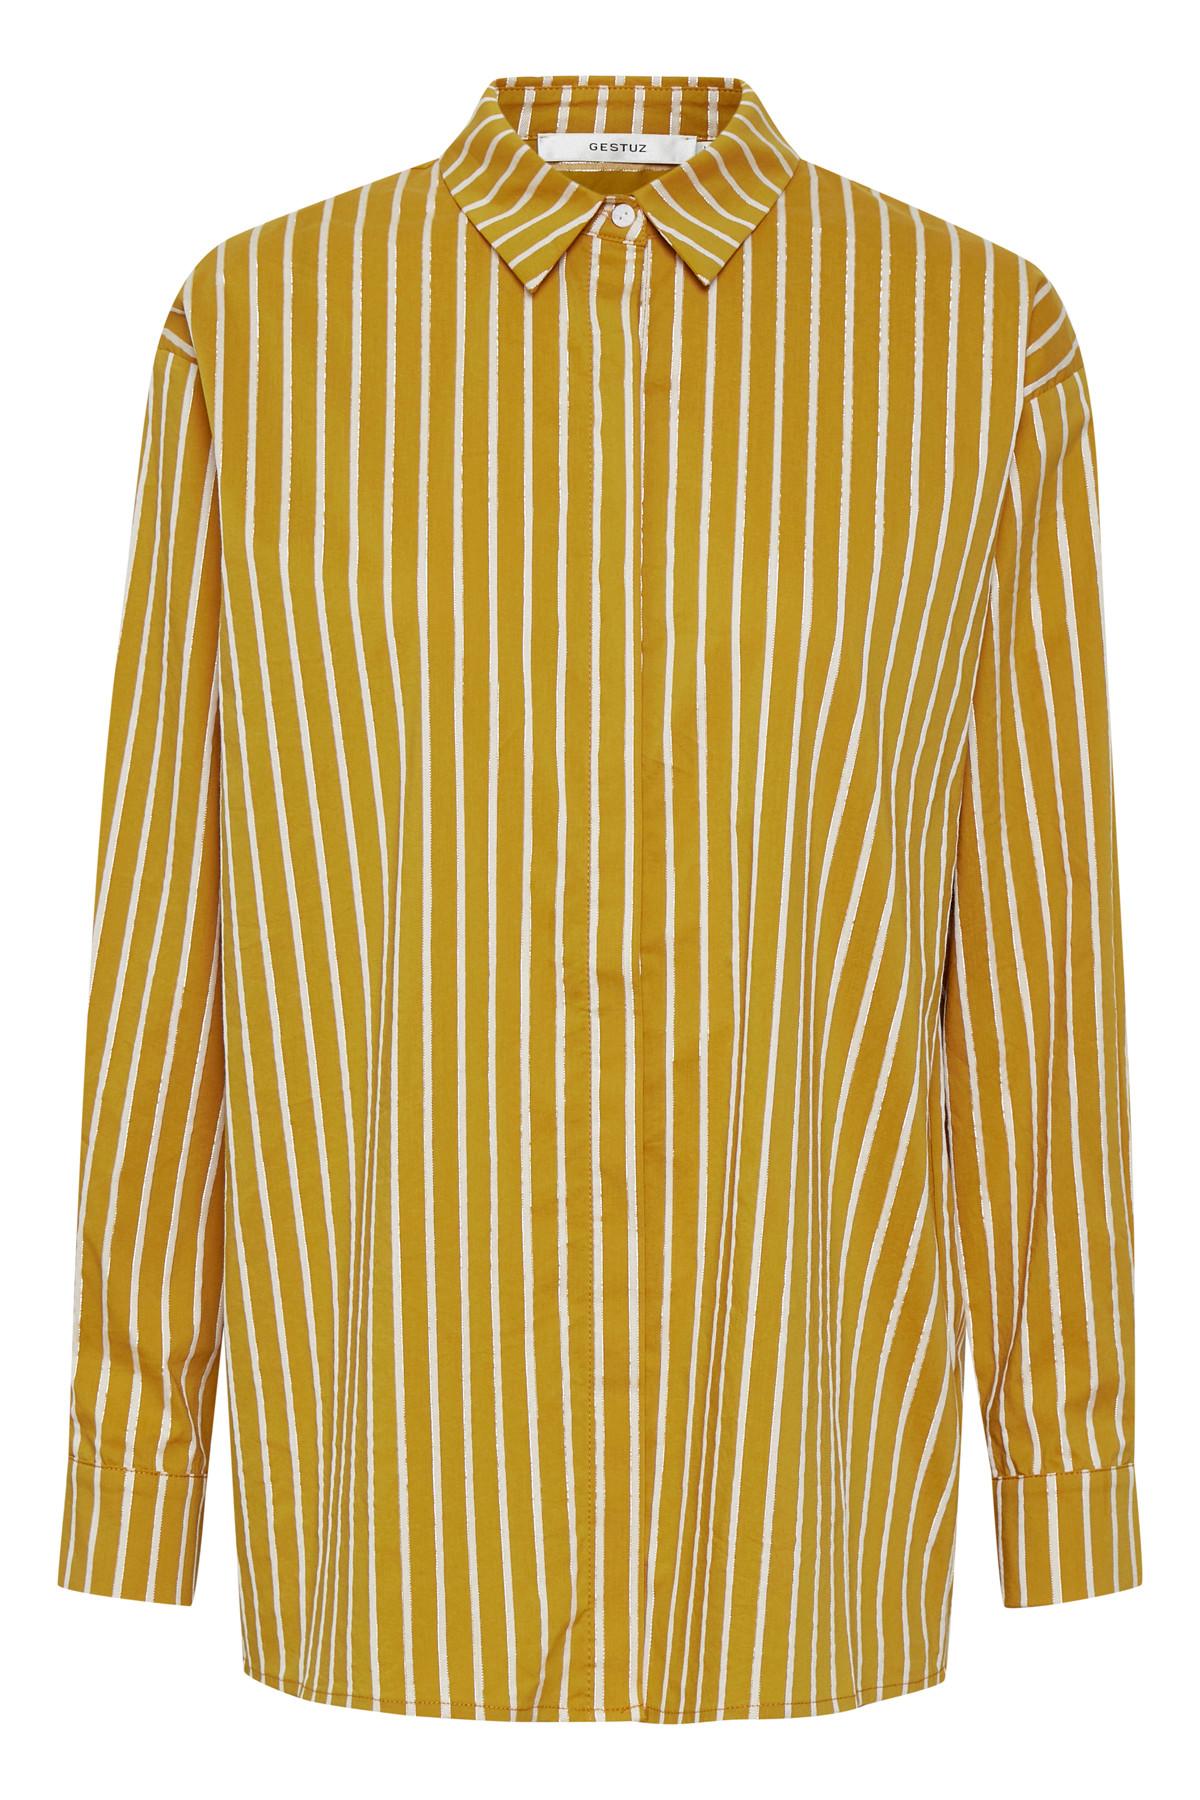 Image of   GESTUZ BETHANYGZ SKJORTE (Narcissus Yellow 90576, 40)